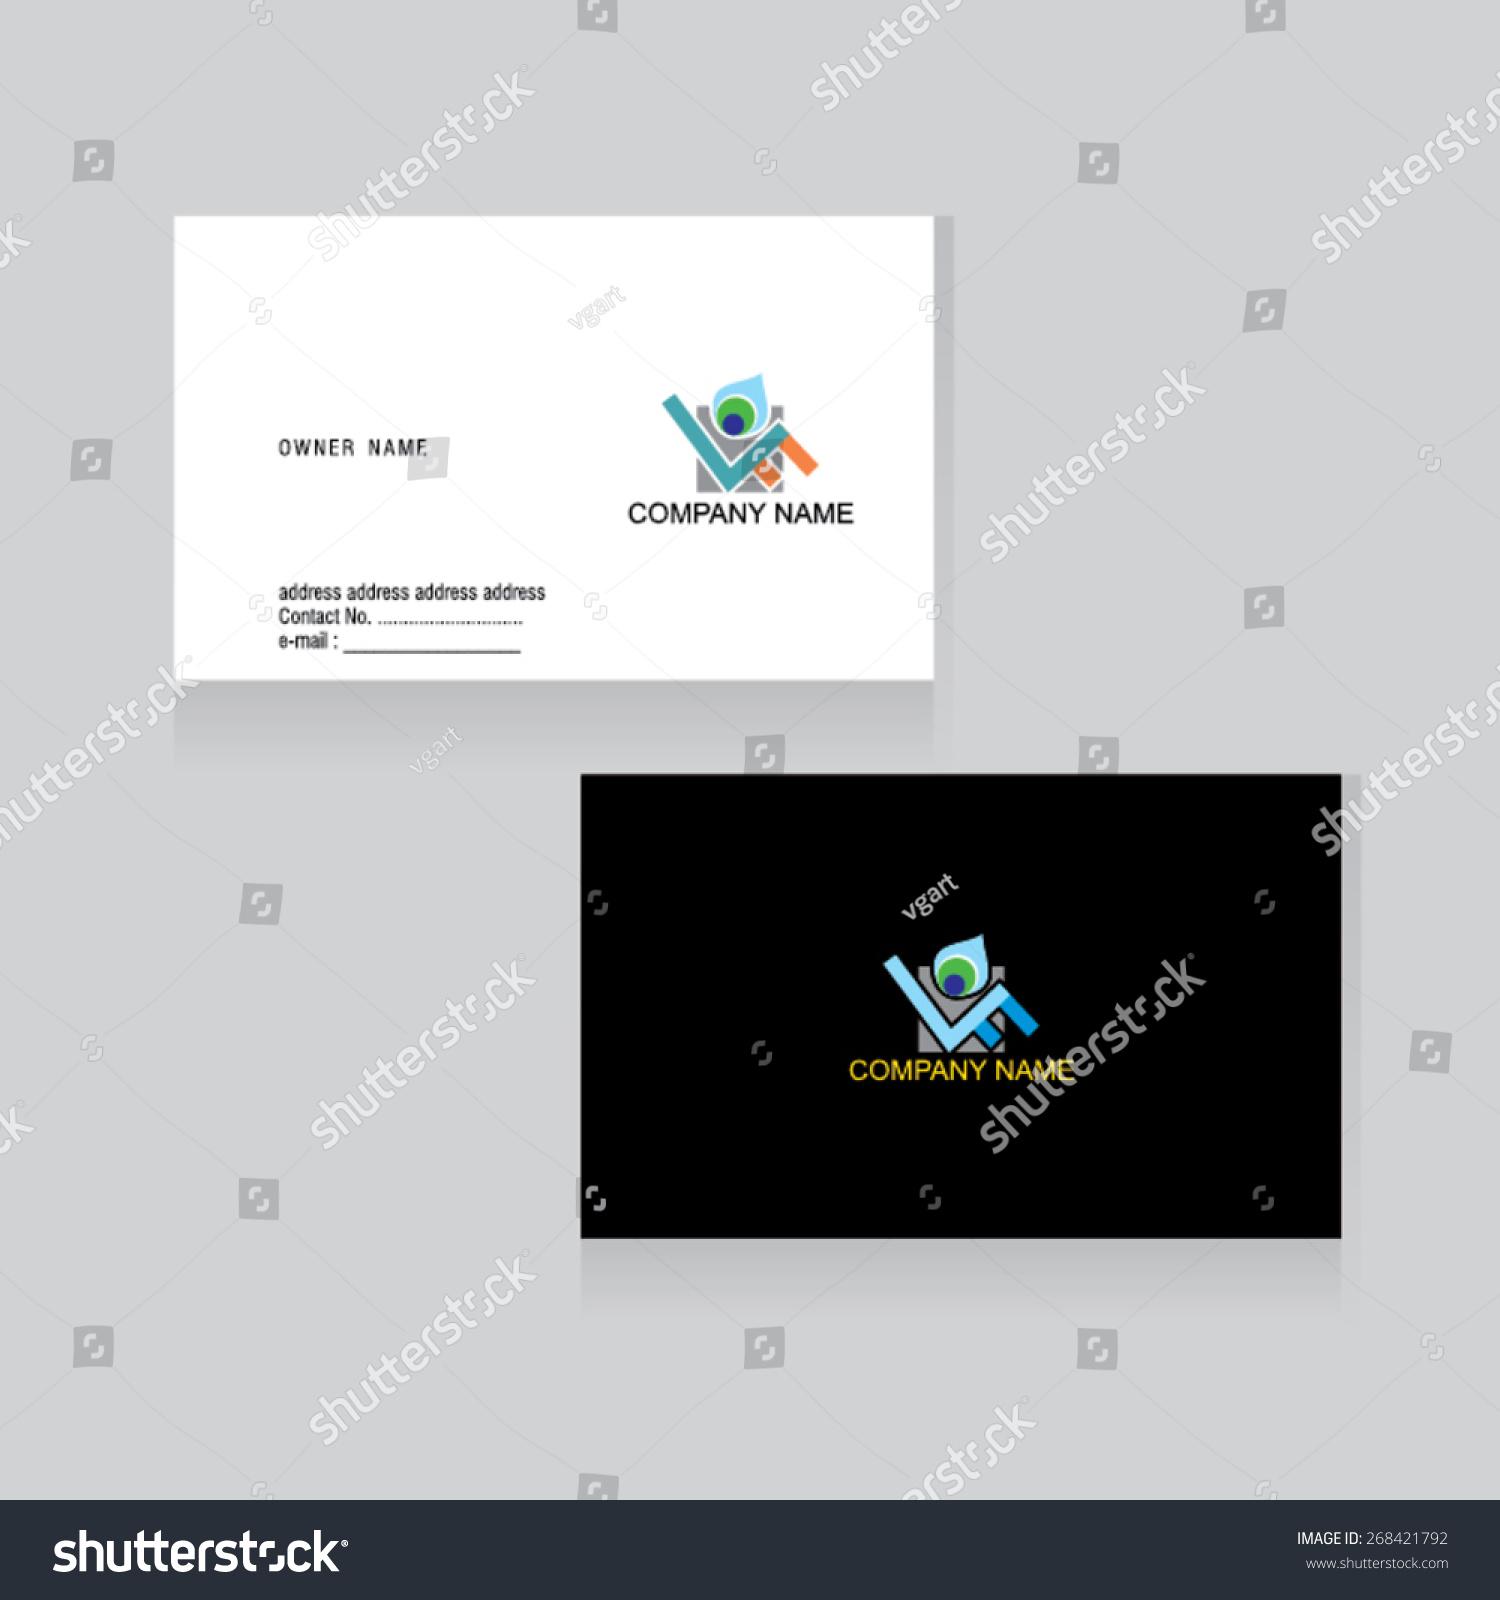 Business Card Idea Vector Illustration Stock Vector (Royalty Free